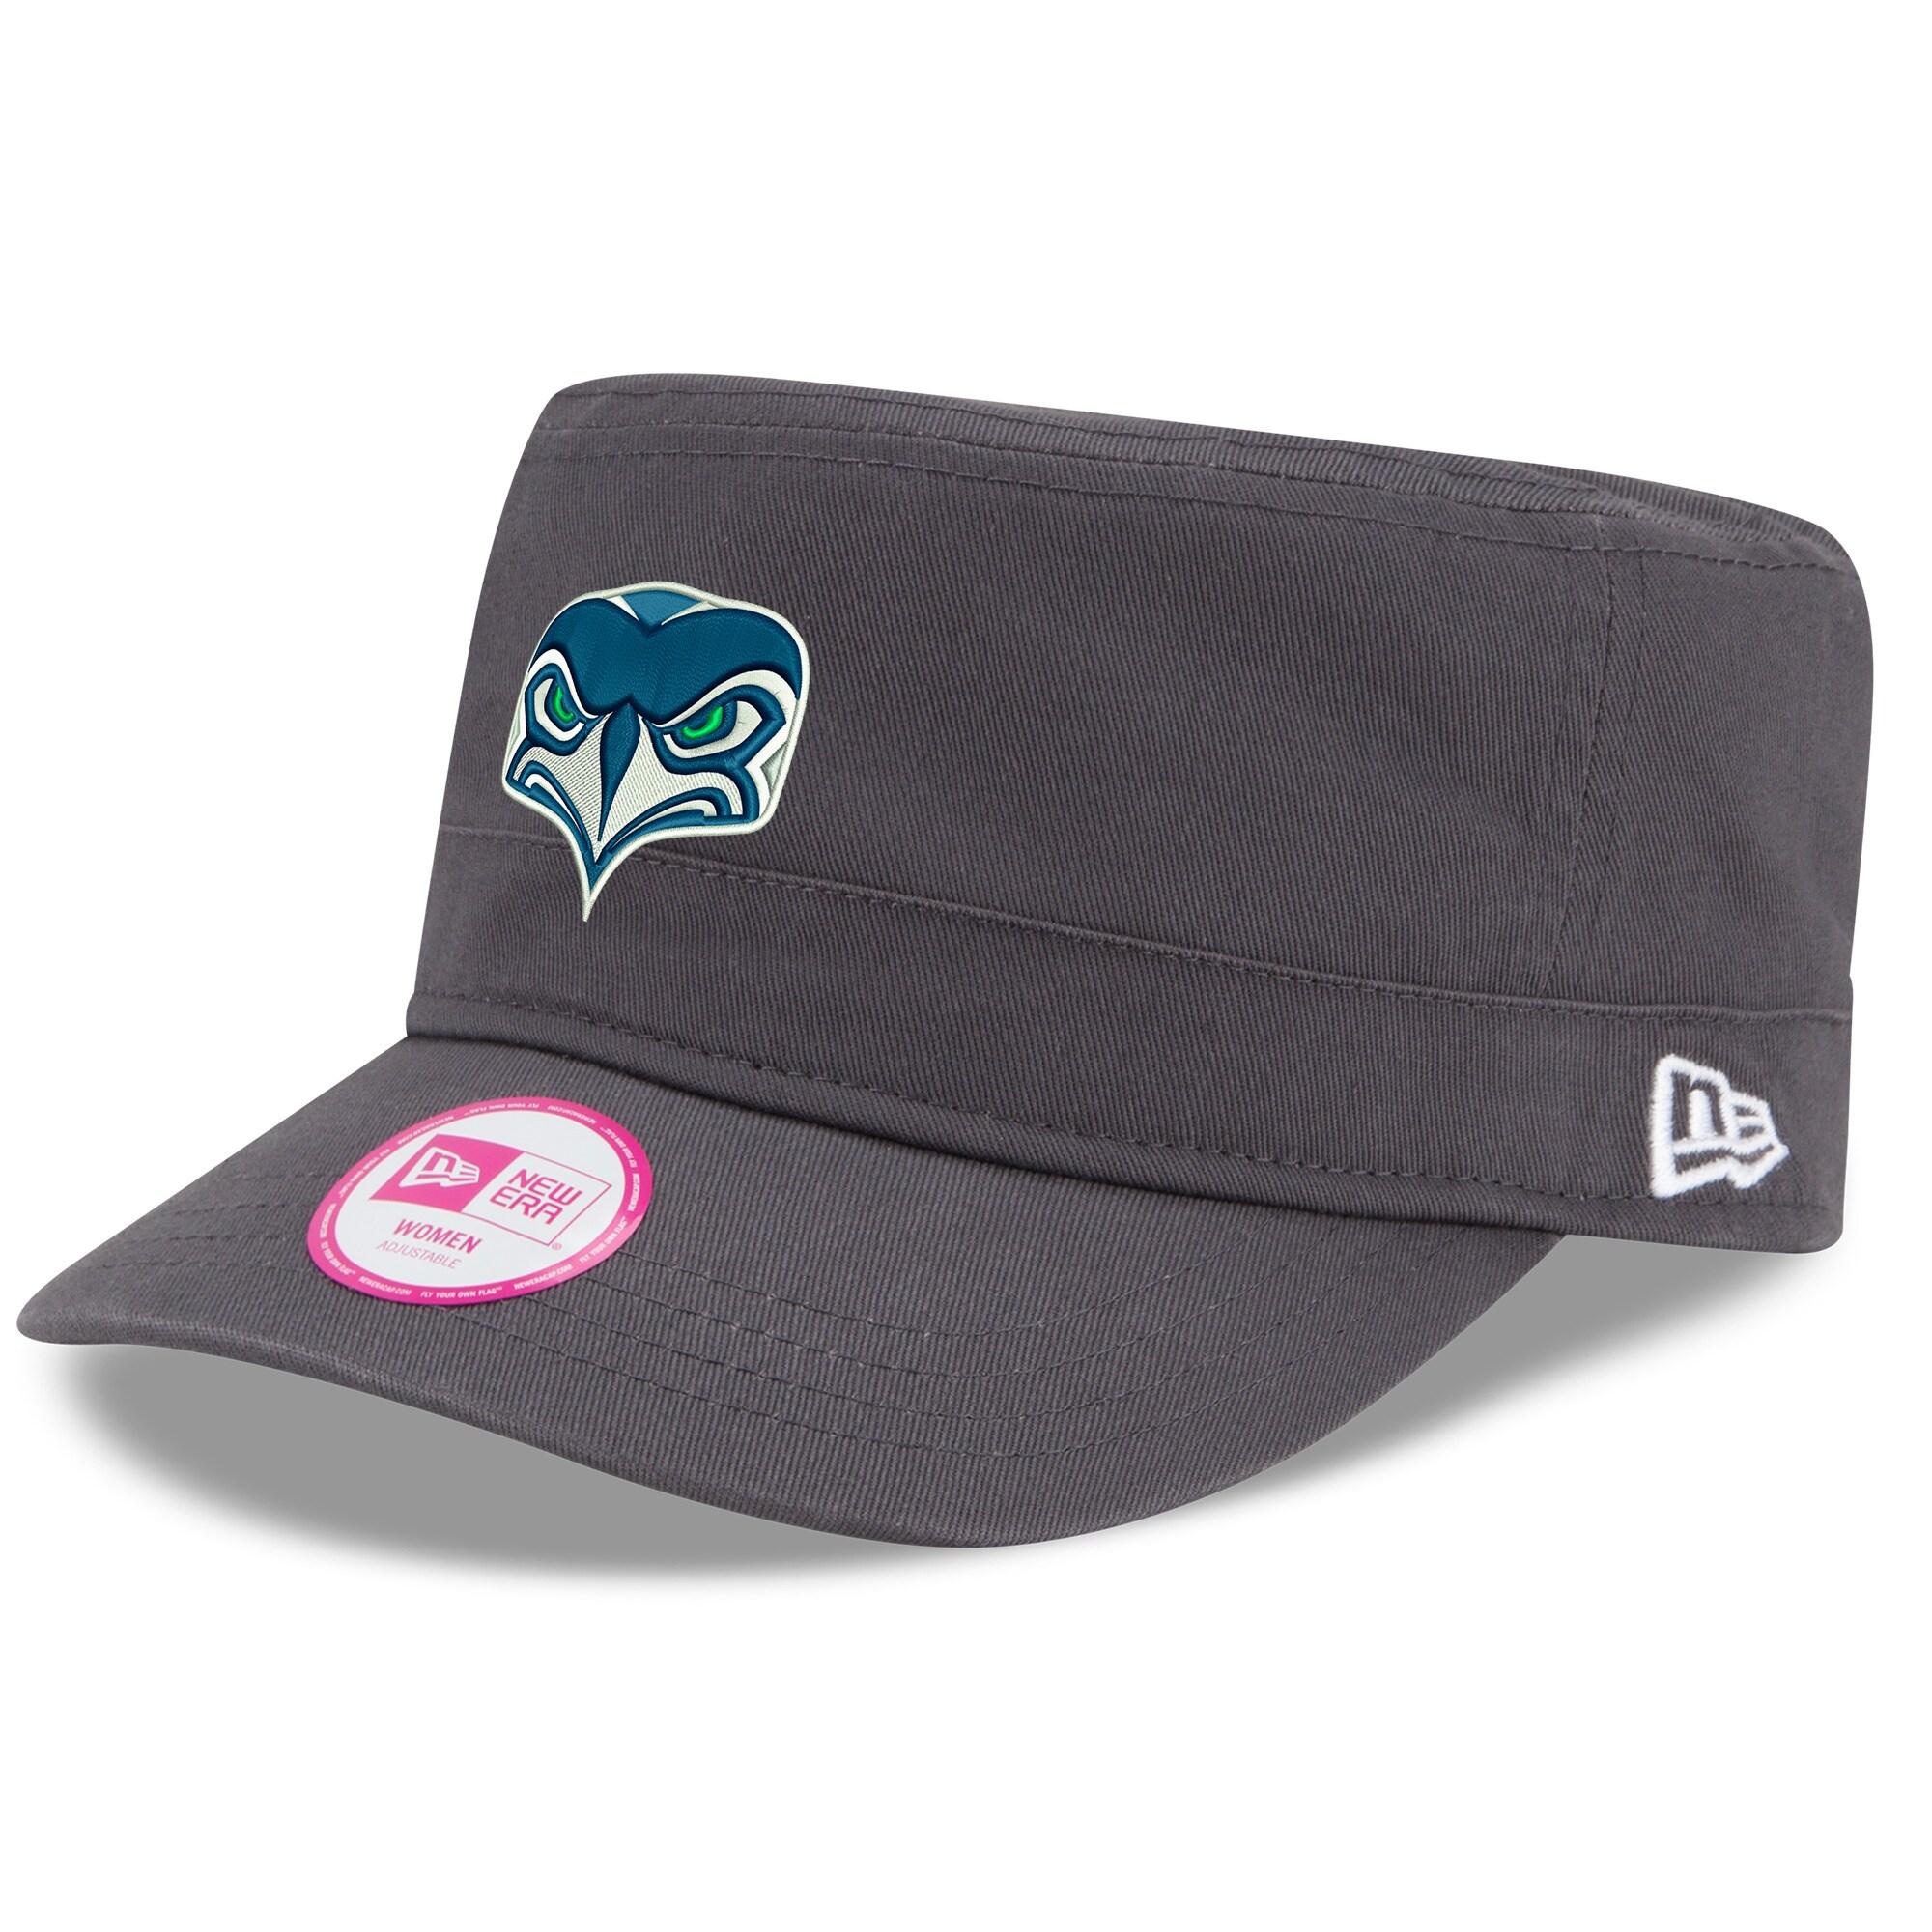 Seattle Seahawks New Era Women's Alternate Team Logo Gear Military Adjustable Hat - Graphite